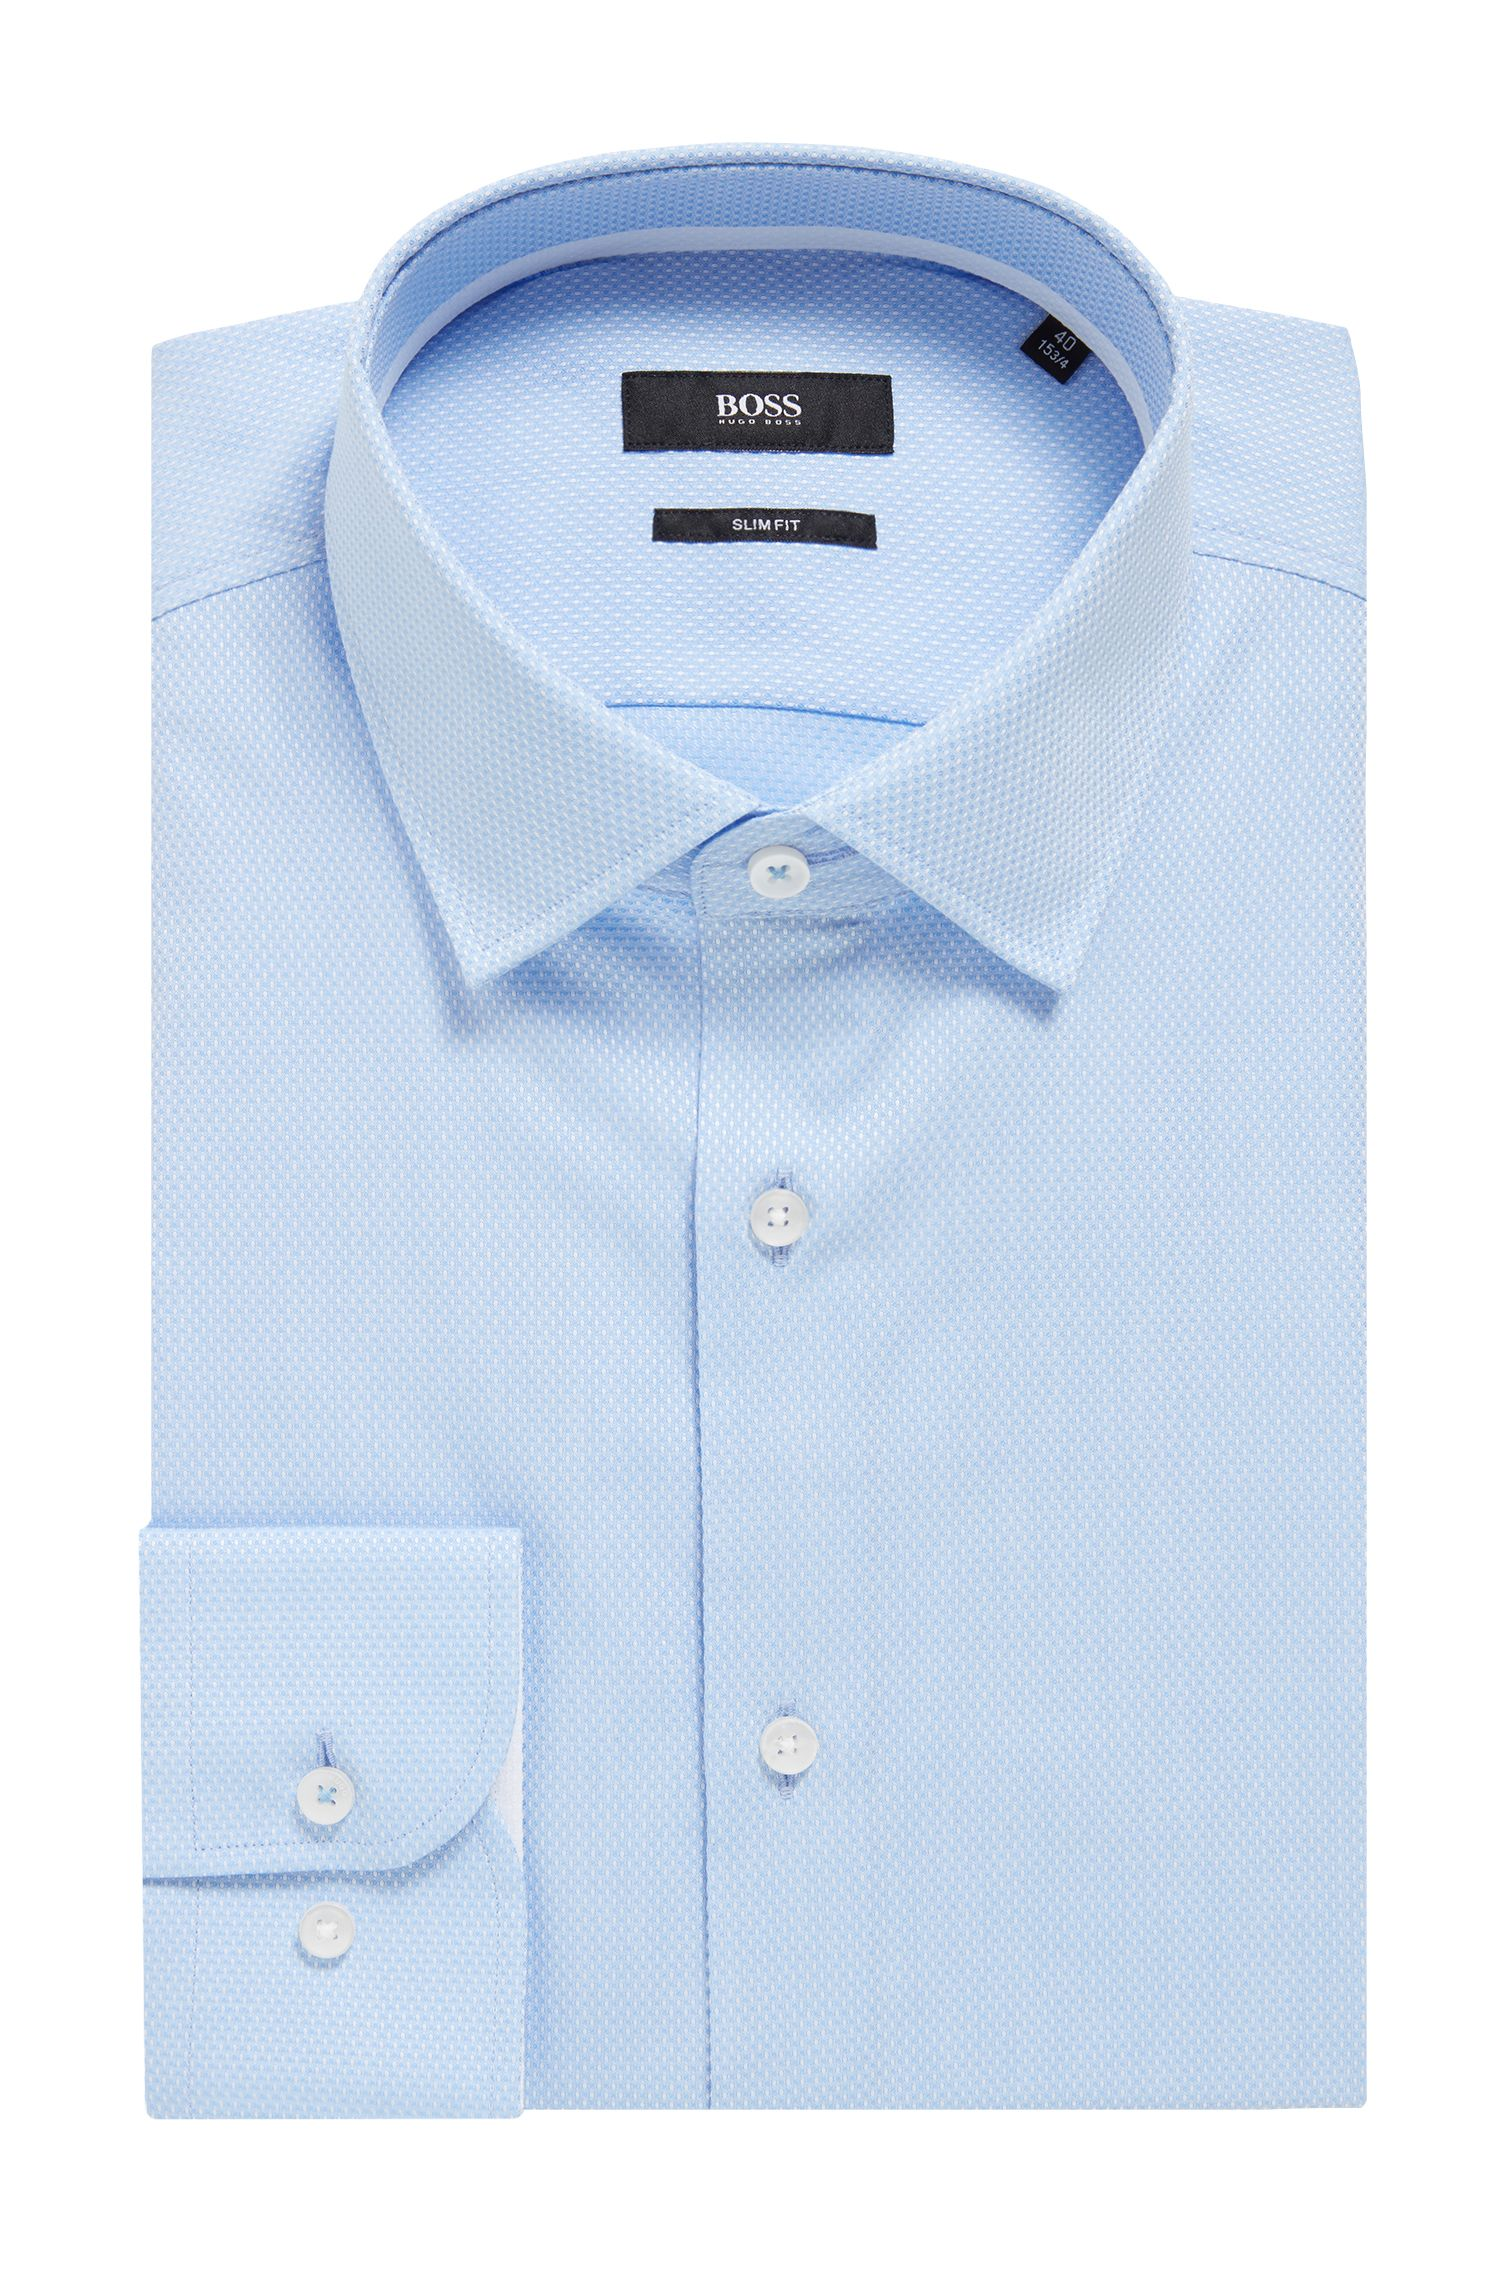 Camisa slim fit en algodón dobby con microtextura, Celeste